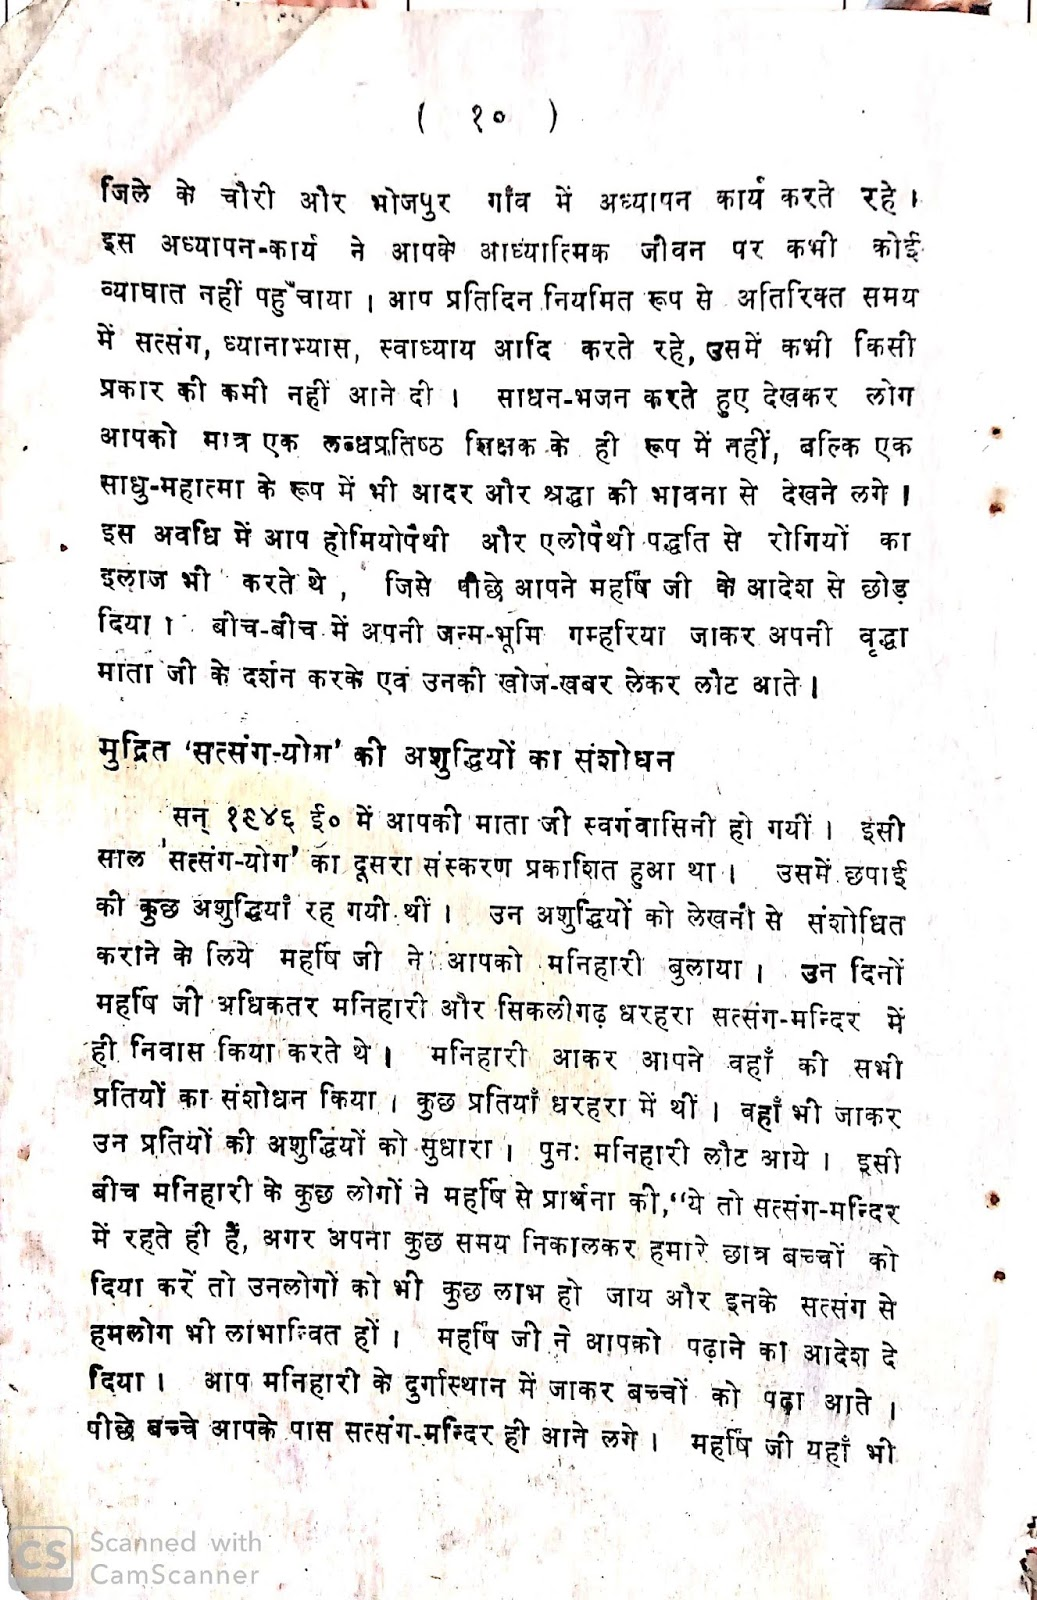 3 पूज्य पाद संतसेवी जी महाराज का परिचय। Brief introduction of Pujya Pad Santsevi Ji Maharaj। संतसेवी परिचय चित्र 10